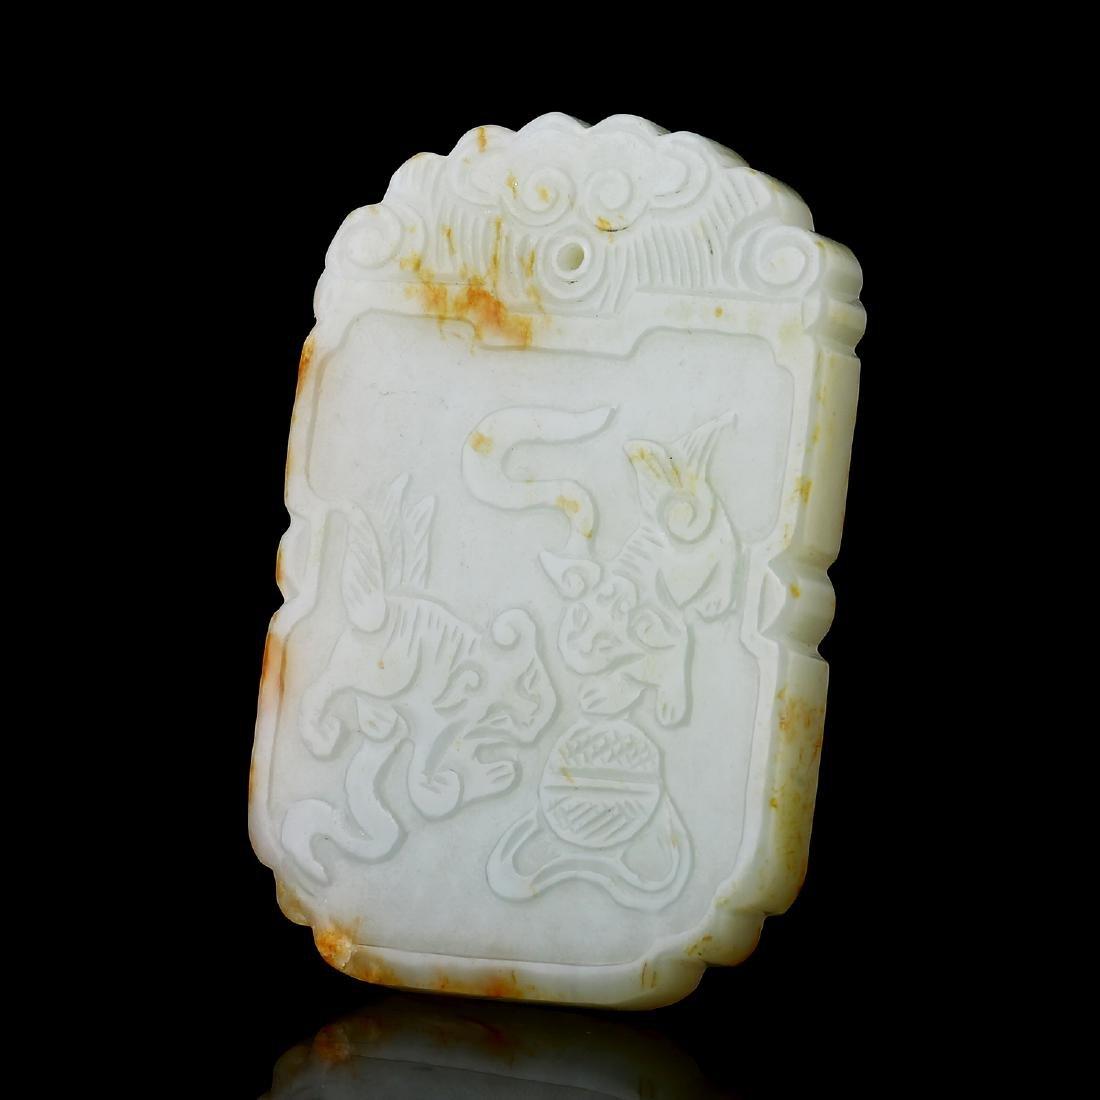 Chinese Qing Dynasty Hetian White Jade Pendant - 6